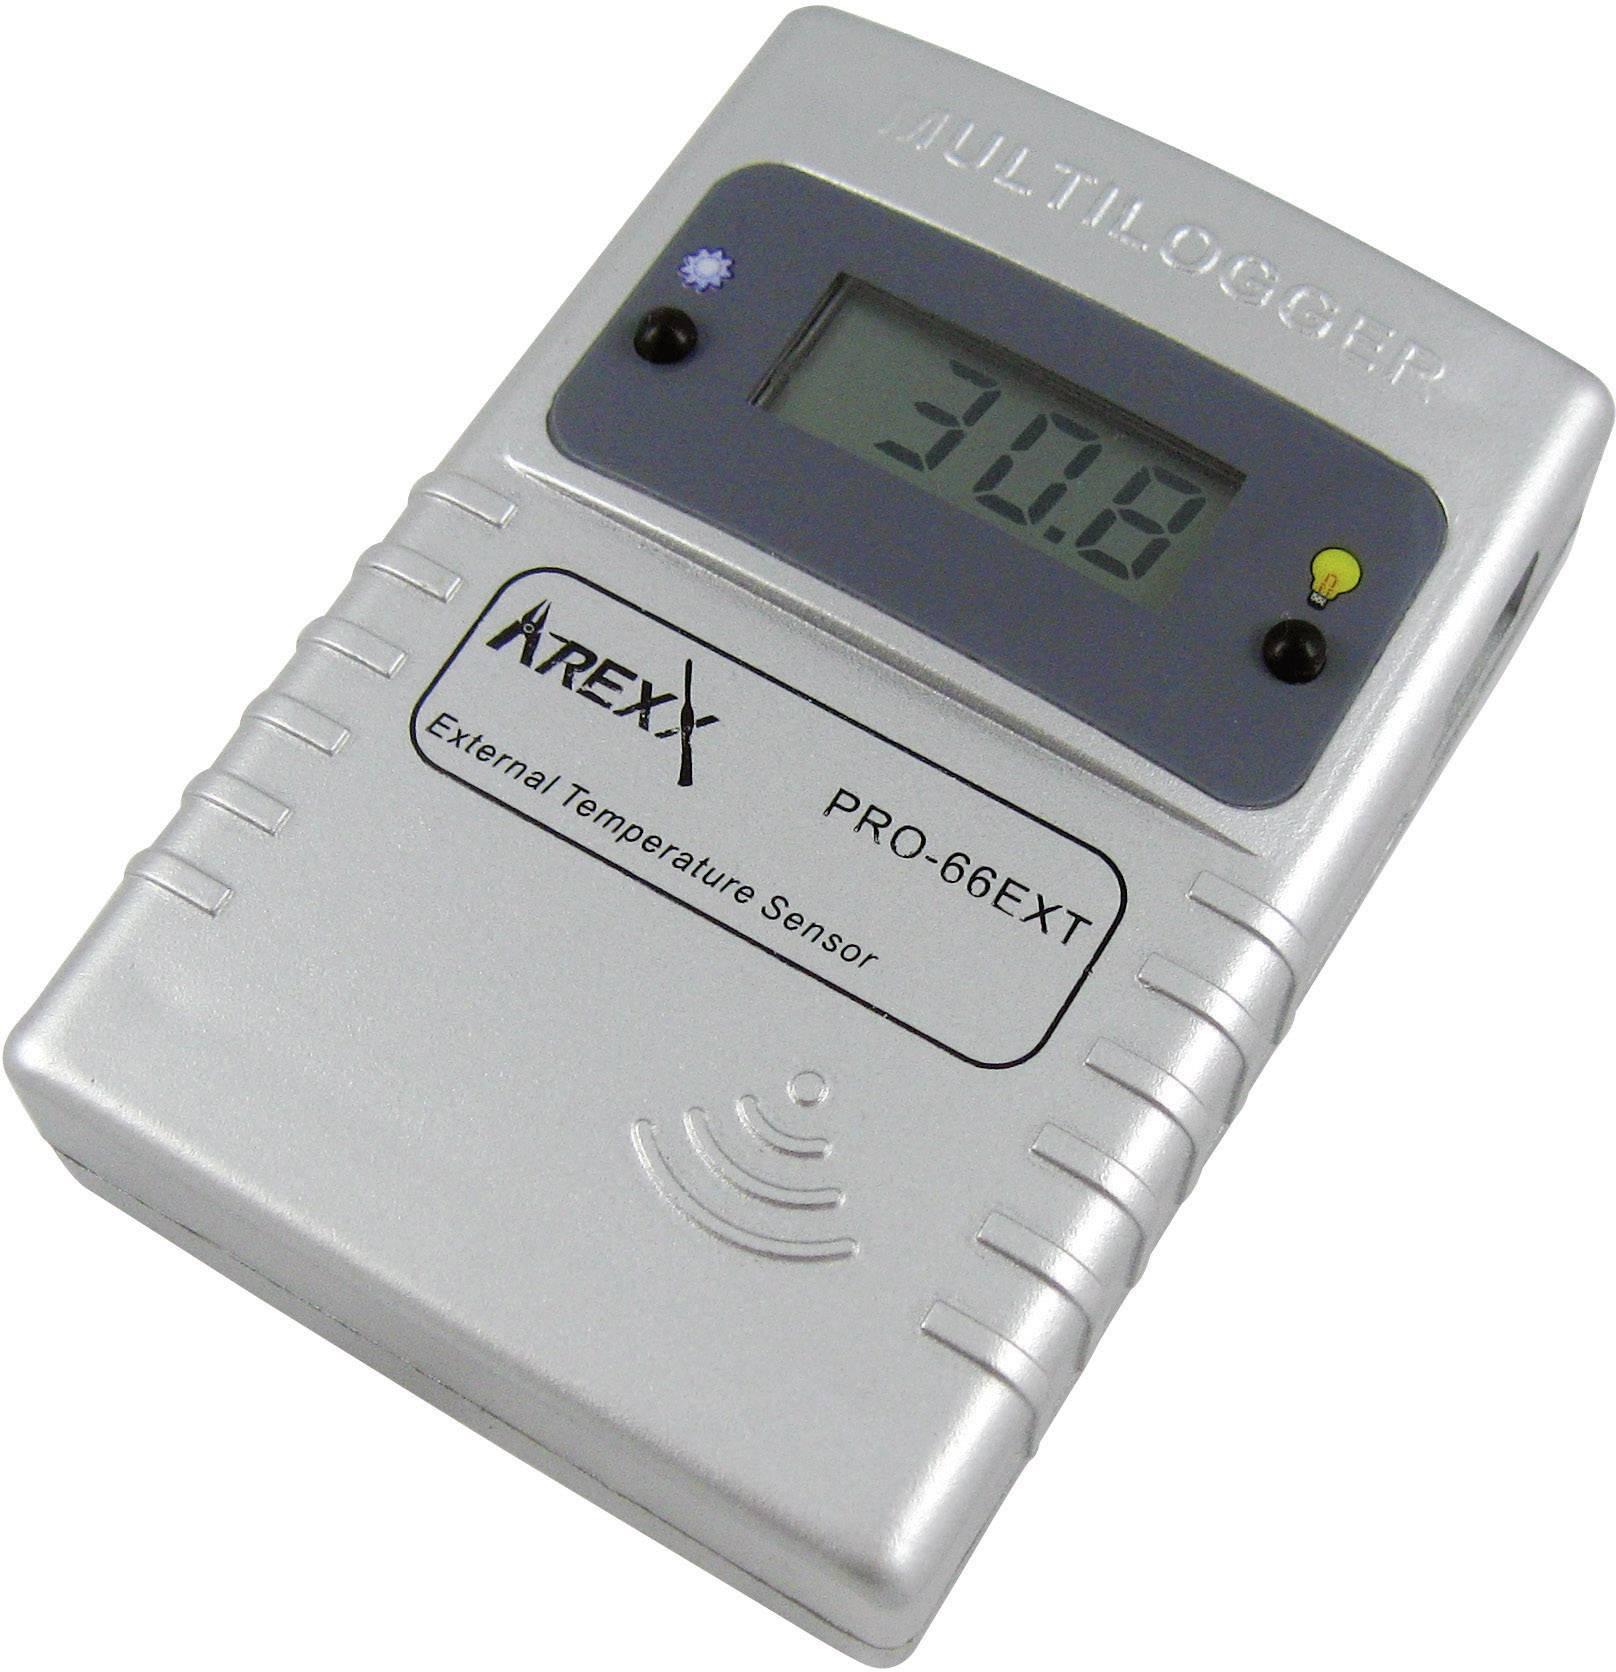 Teplotný datalogger Arexx PRO-66ext, -55 až +125 °C